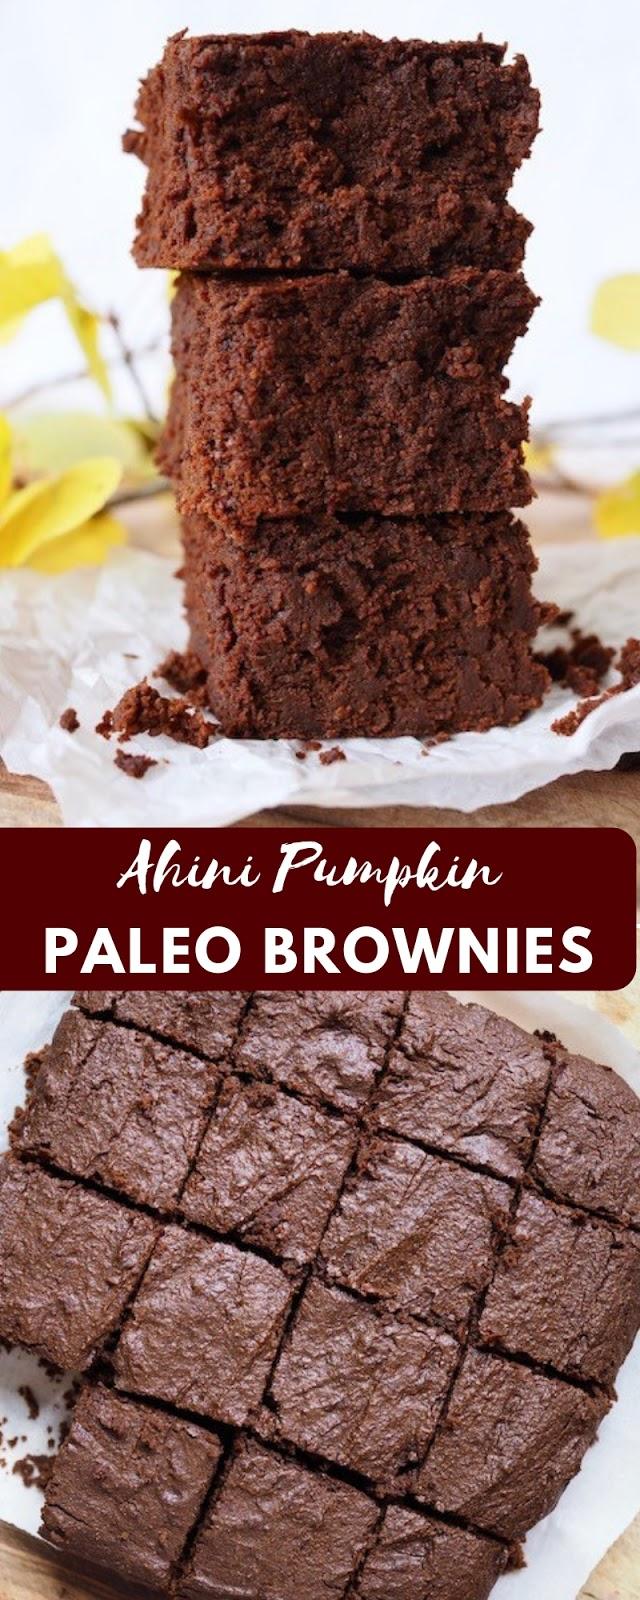 Ahini Pumpkin Paleo Brownies